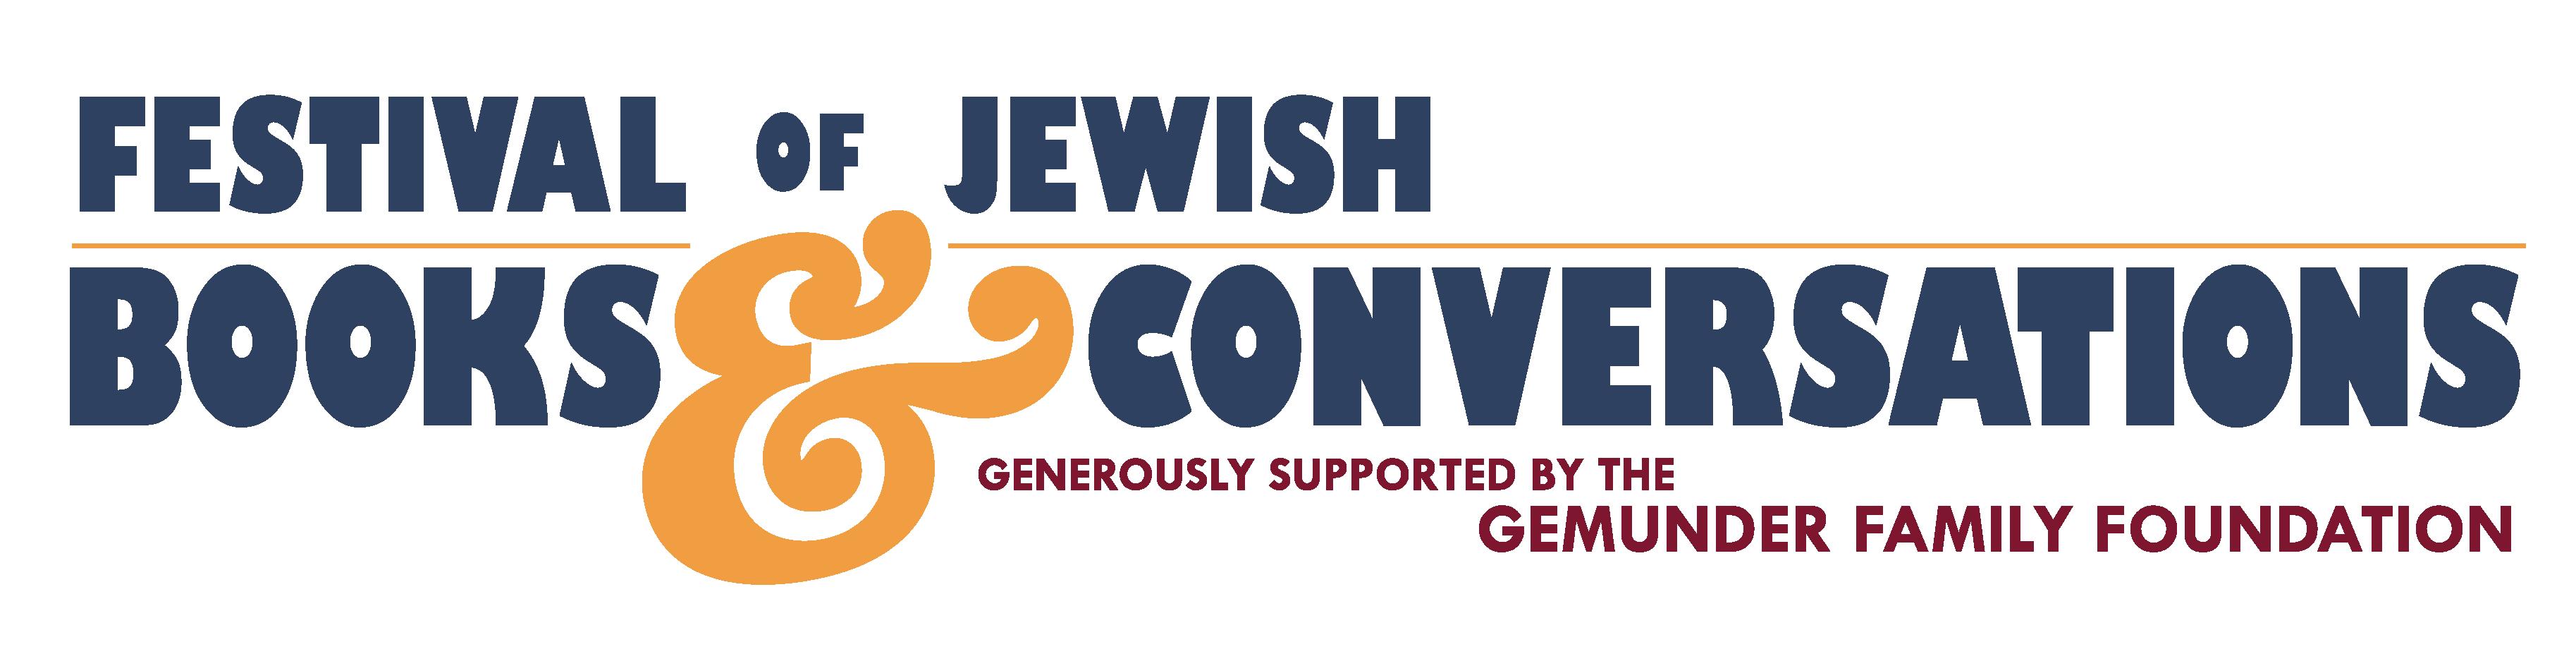 JBF_2017_logo.jpg